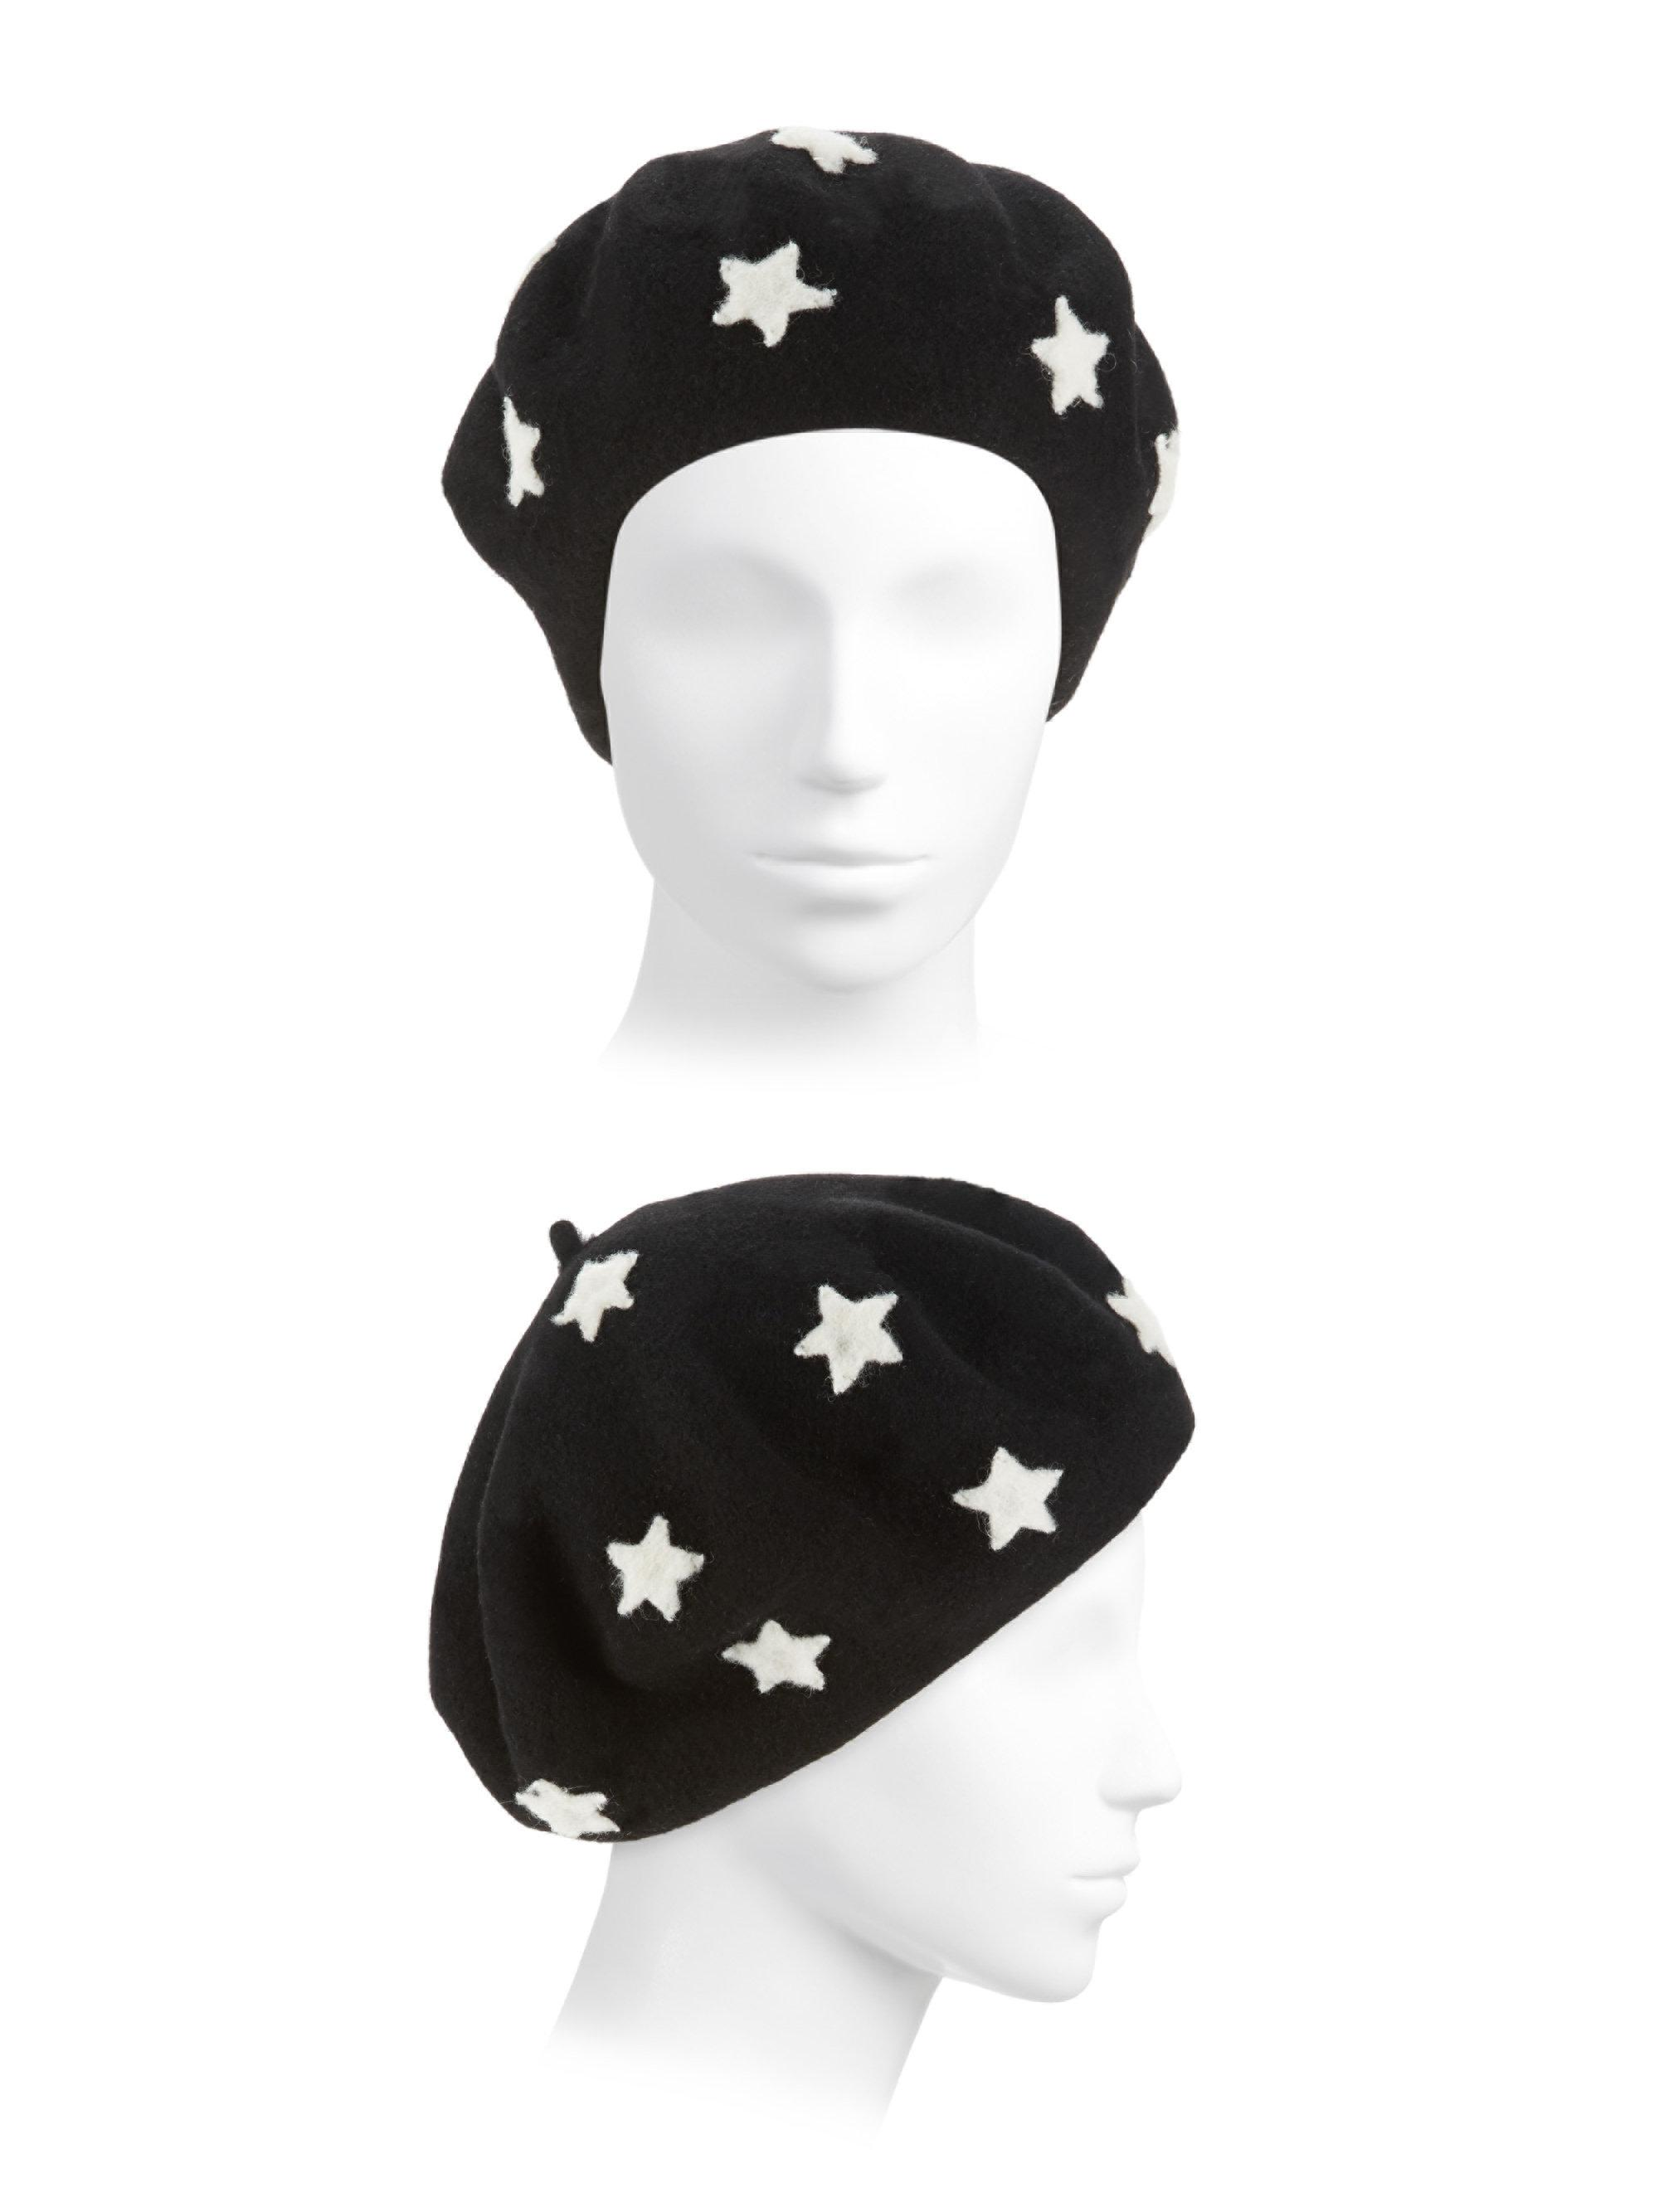 47eb83029a7eb Helene Berman Star Printed Beret in Black - Lyst